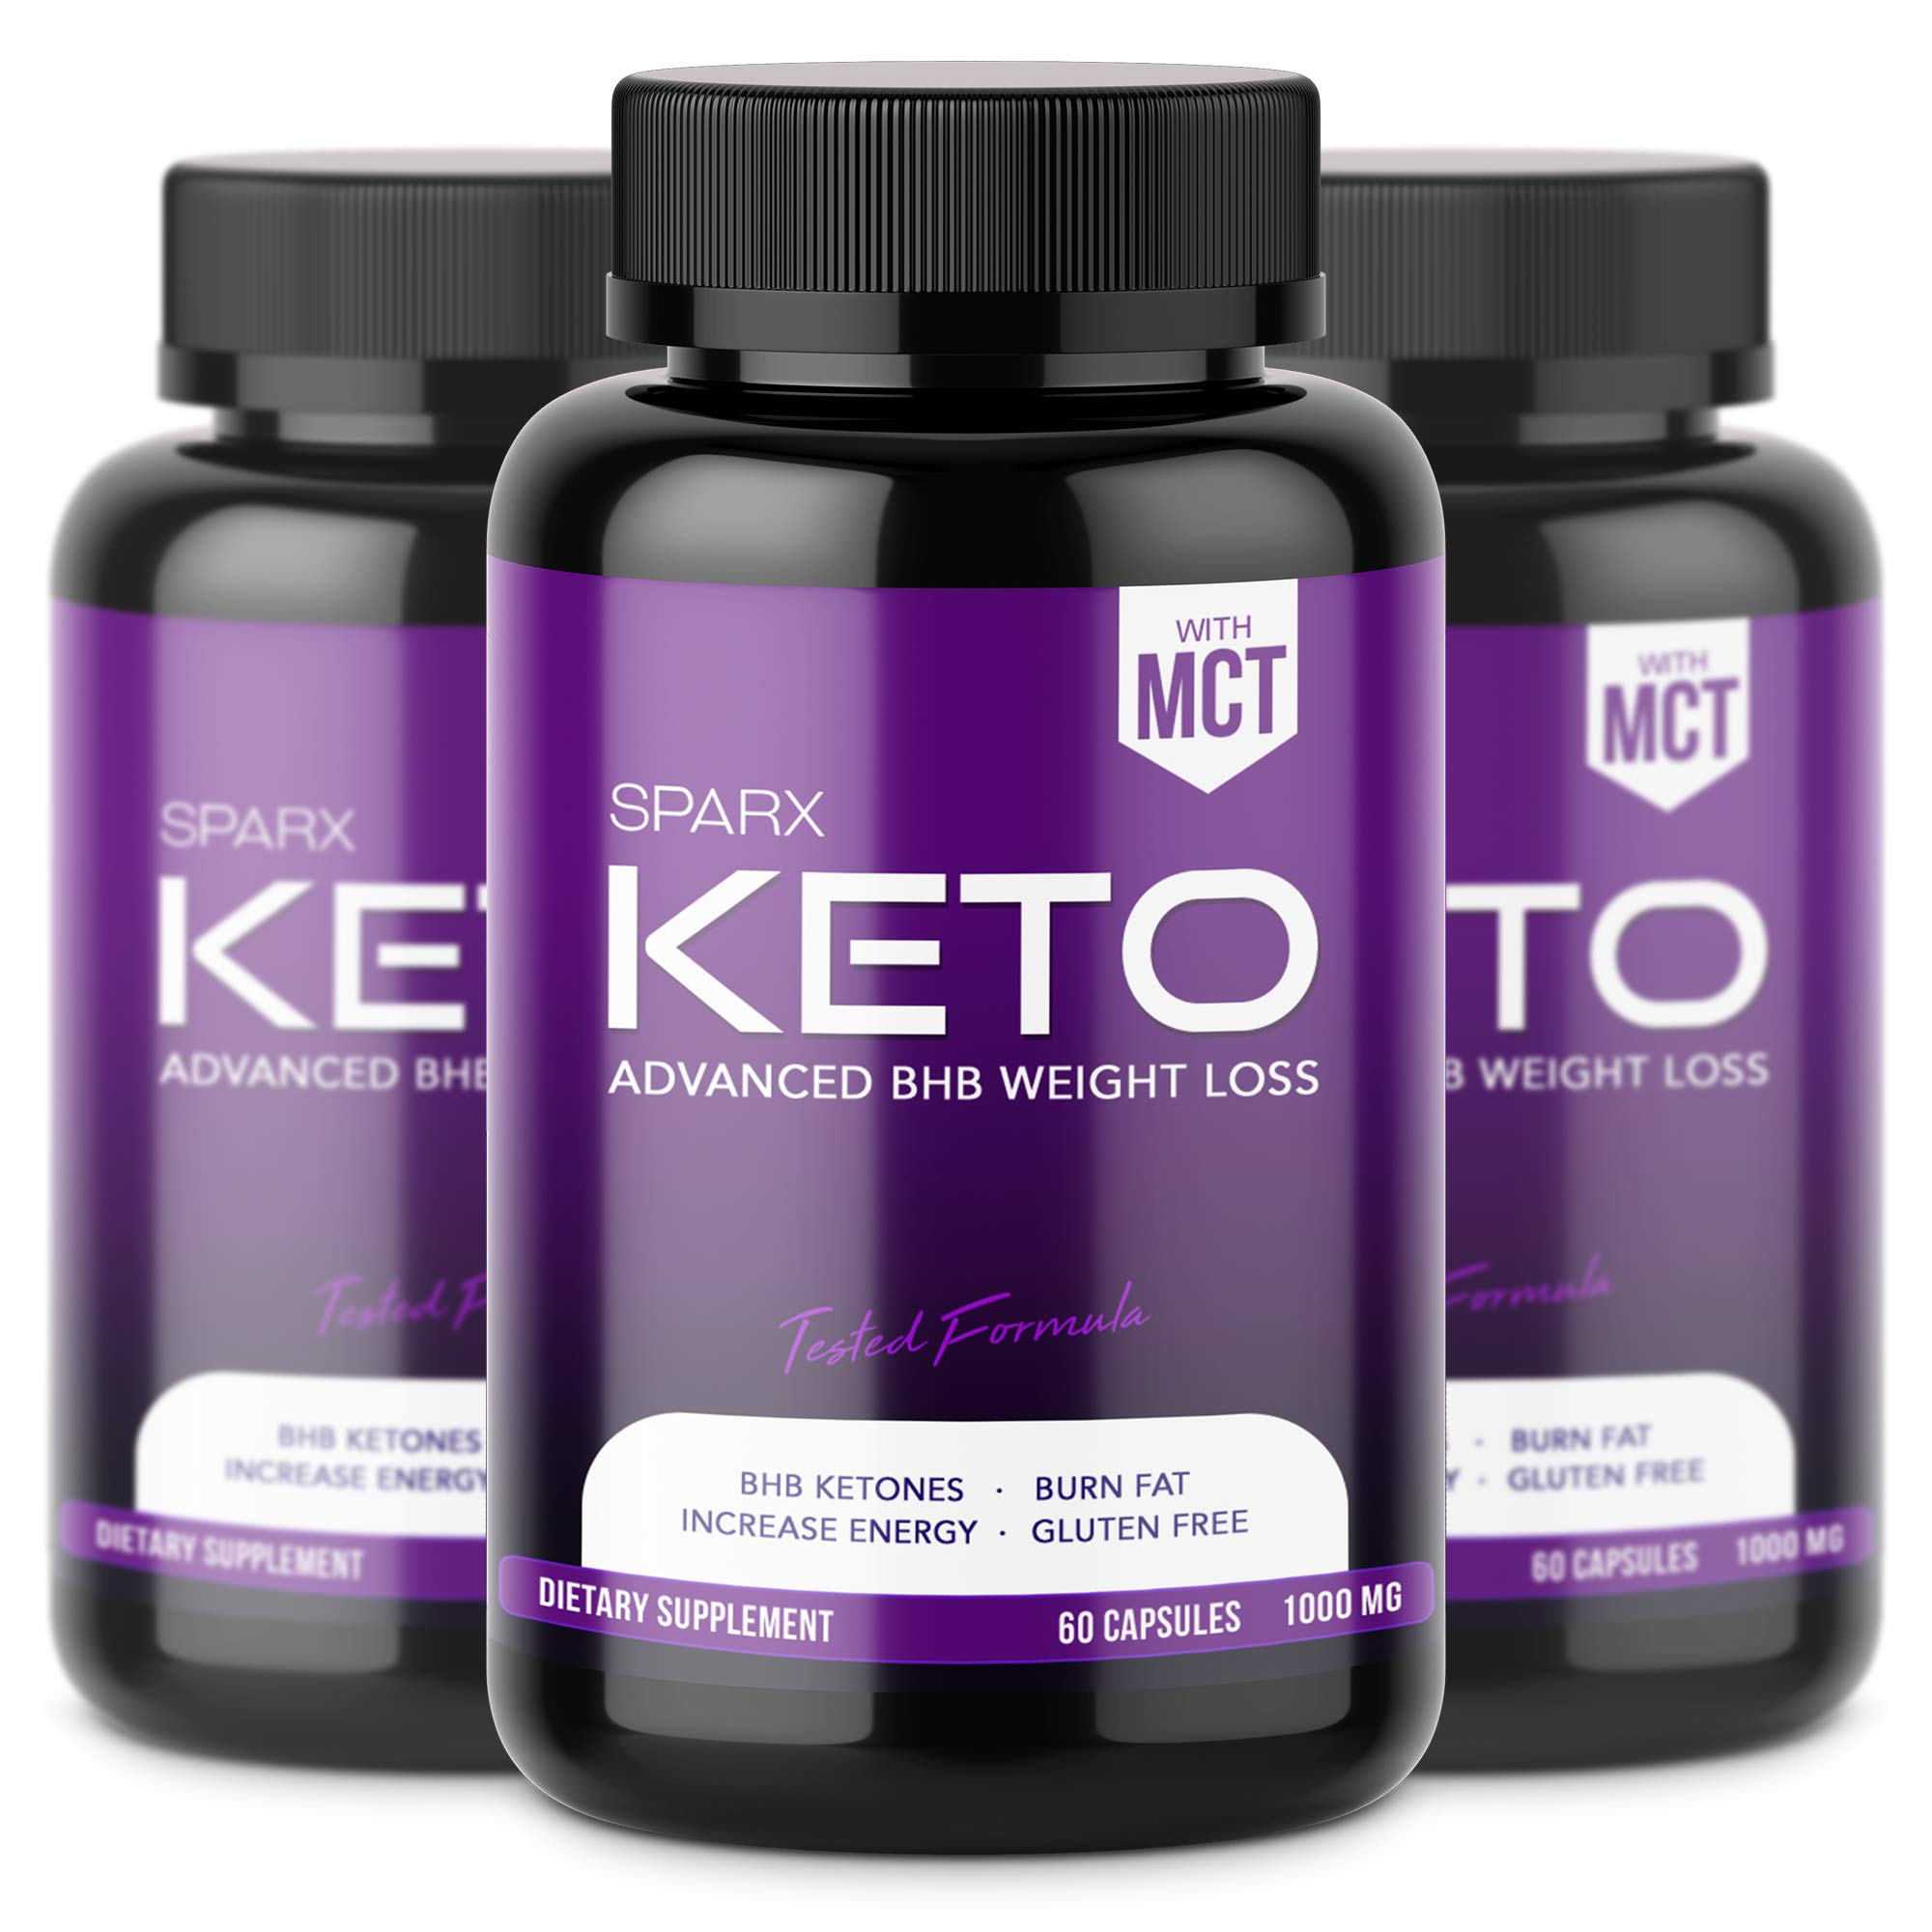 SPARX - (3 JAR) Keto BHB Exogenous Ketones 1000mg (90 Day Supply), Keto Fat Burner - Support Ketosis, Boost Energy, Enhance Focus, Perfect Keto Weight Loss Capsules, Beta-Hydroxybutyrate BHB Salts